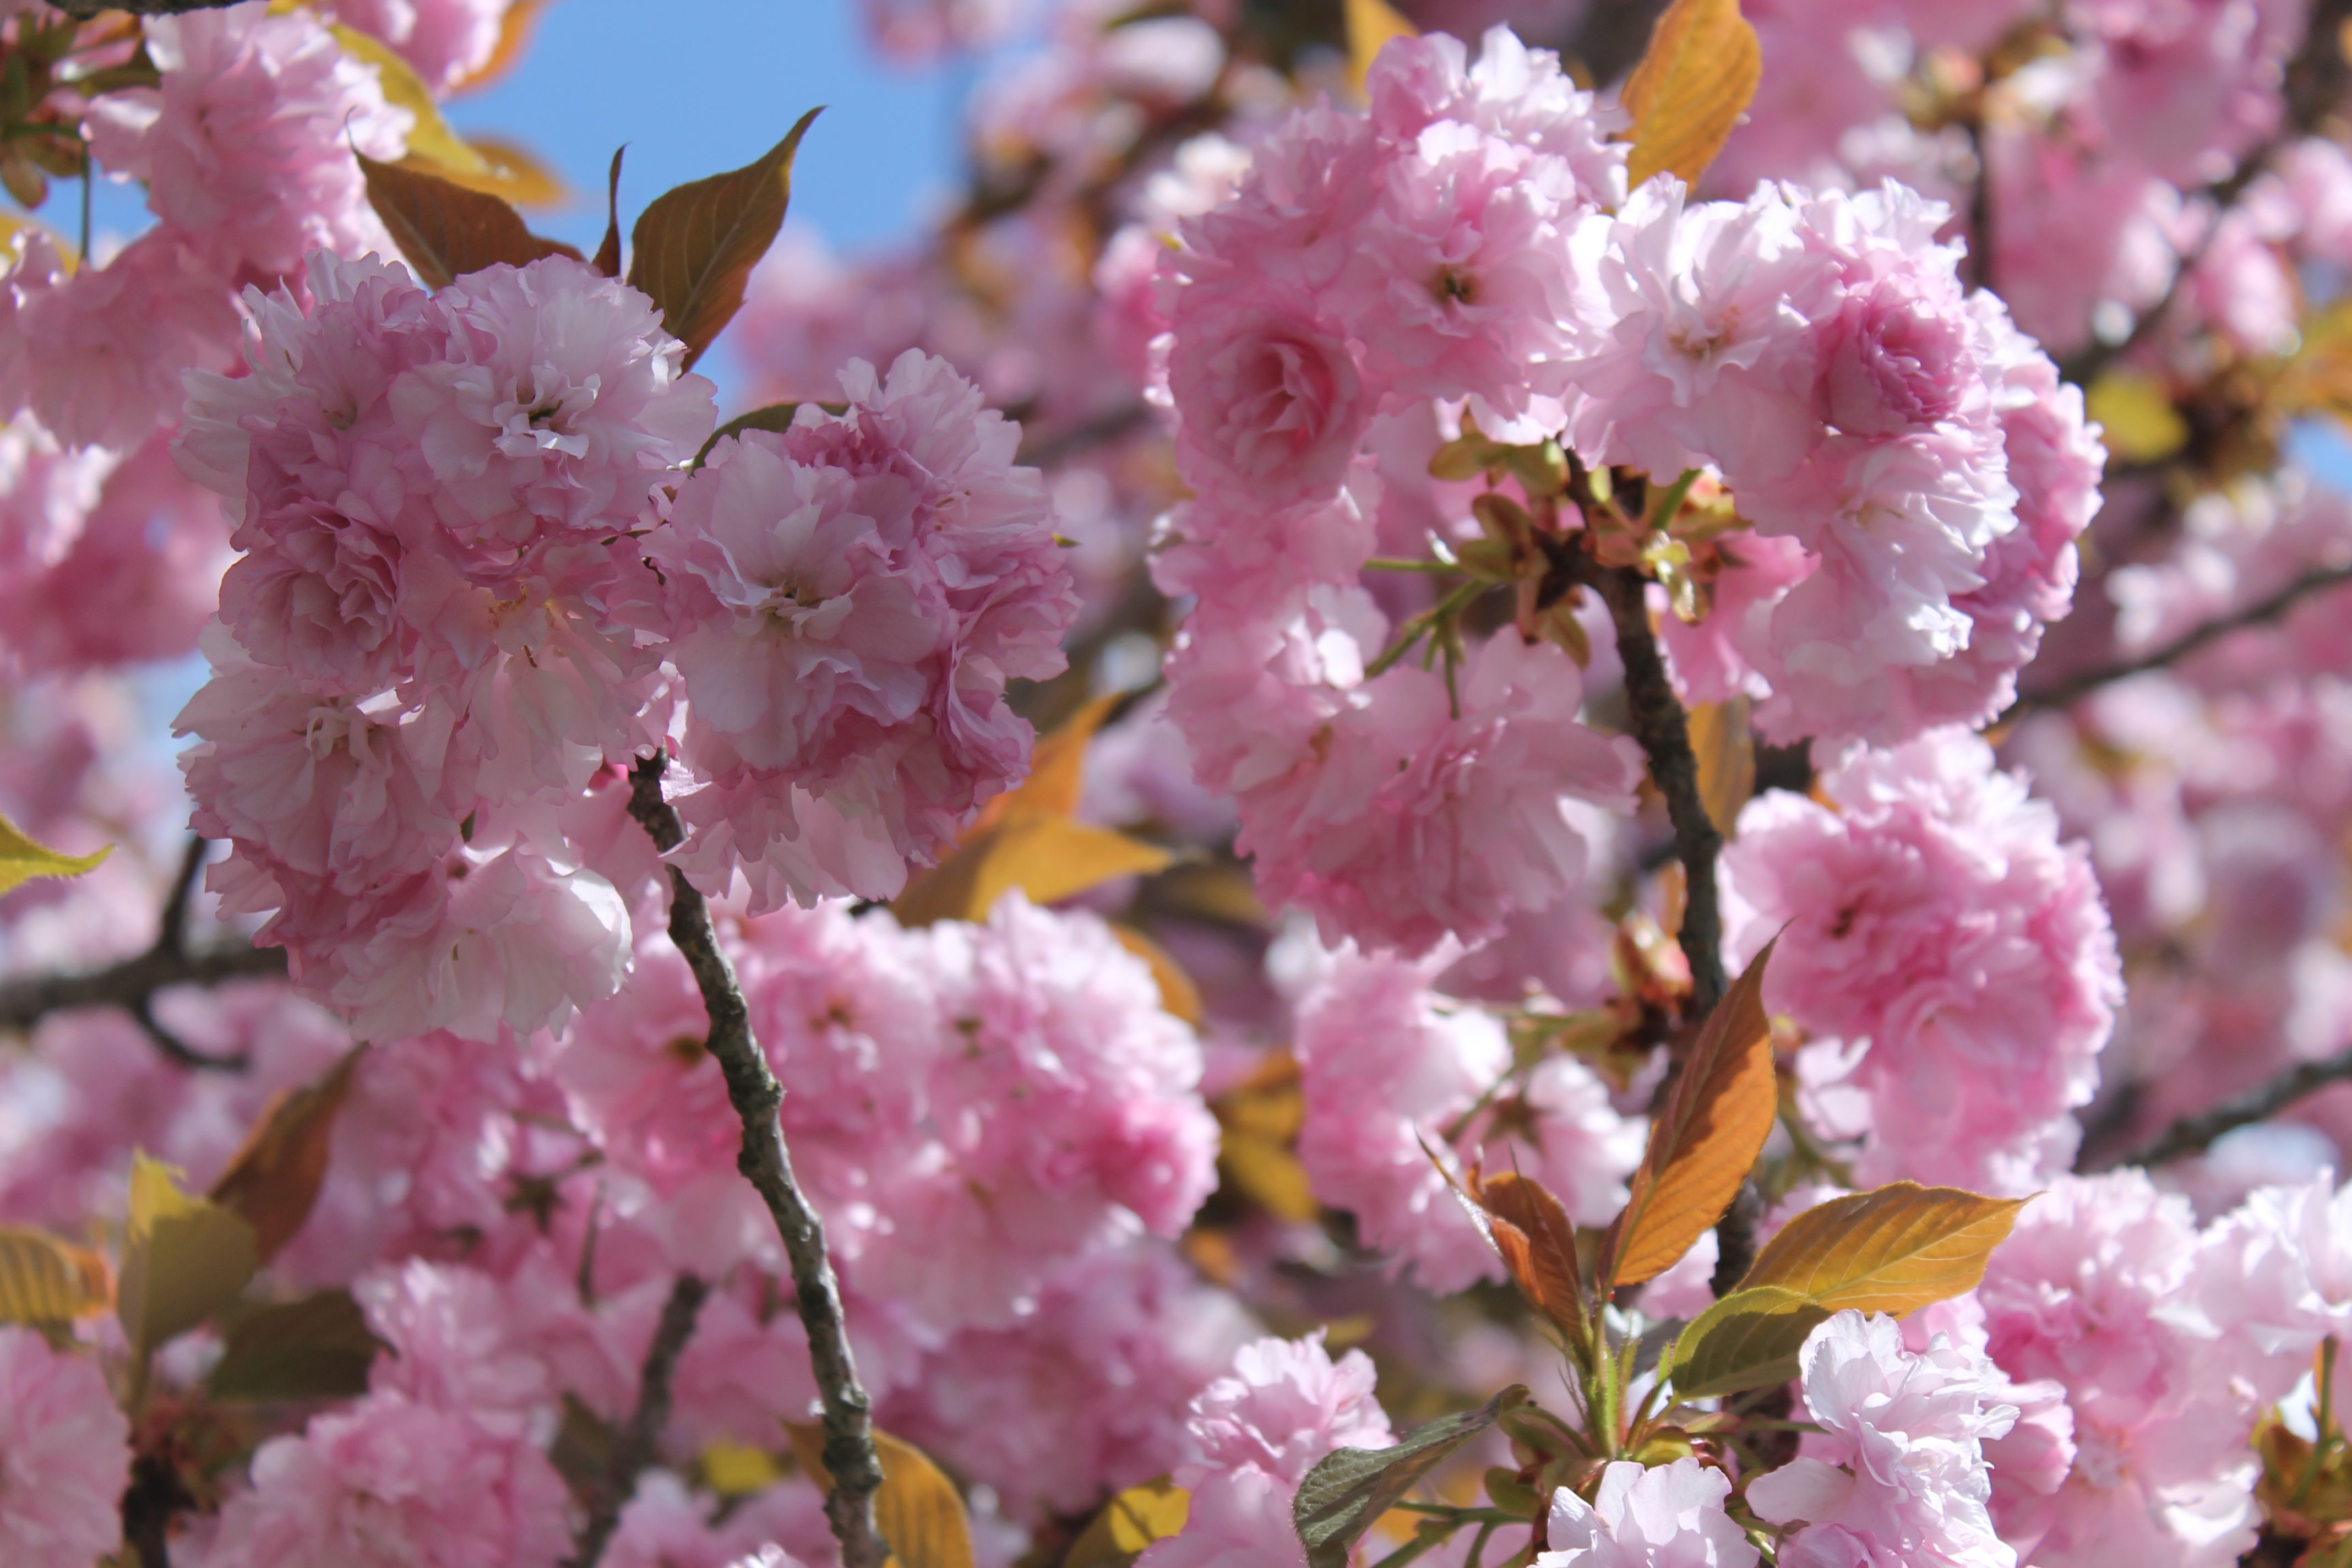 Mock Cherry Tree In Full Bloom Bloom Flower Petals Cherry Tree